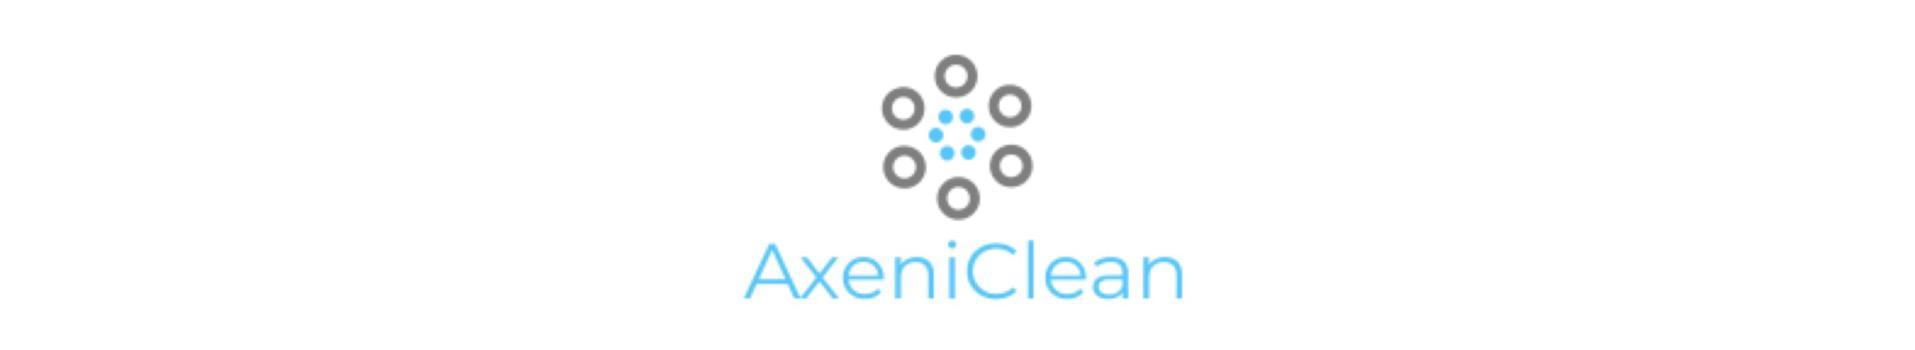 AxeniClean